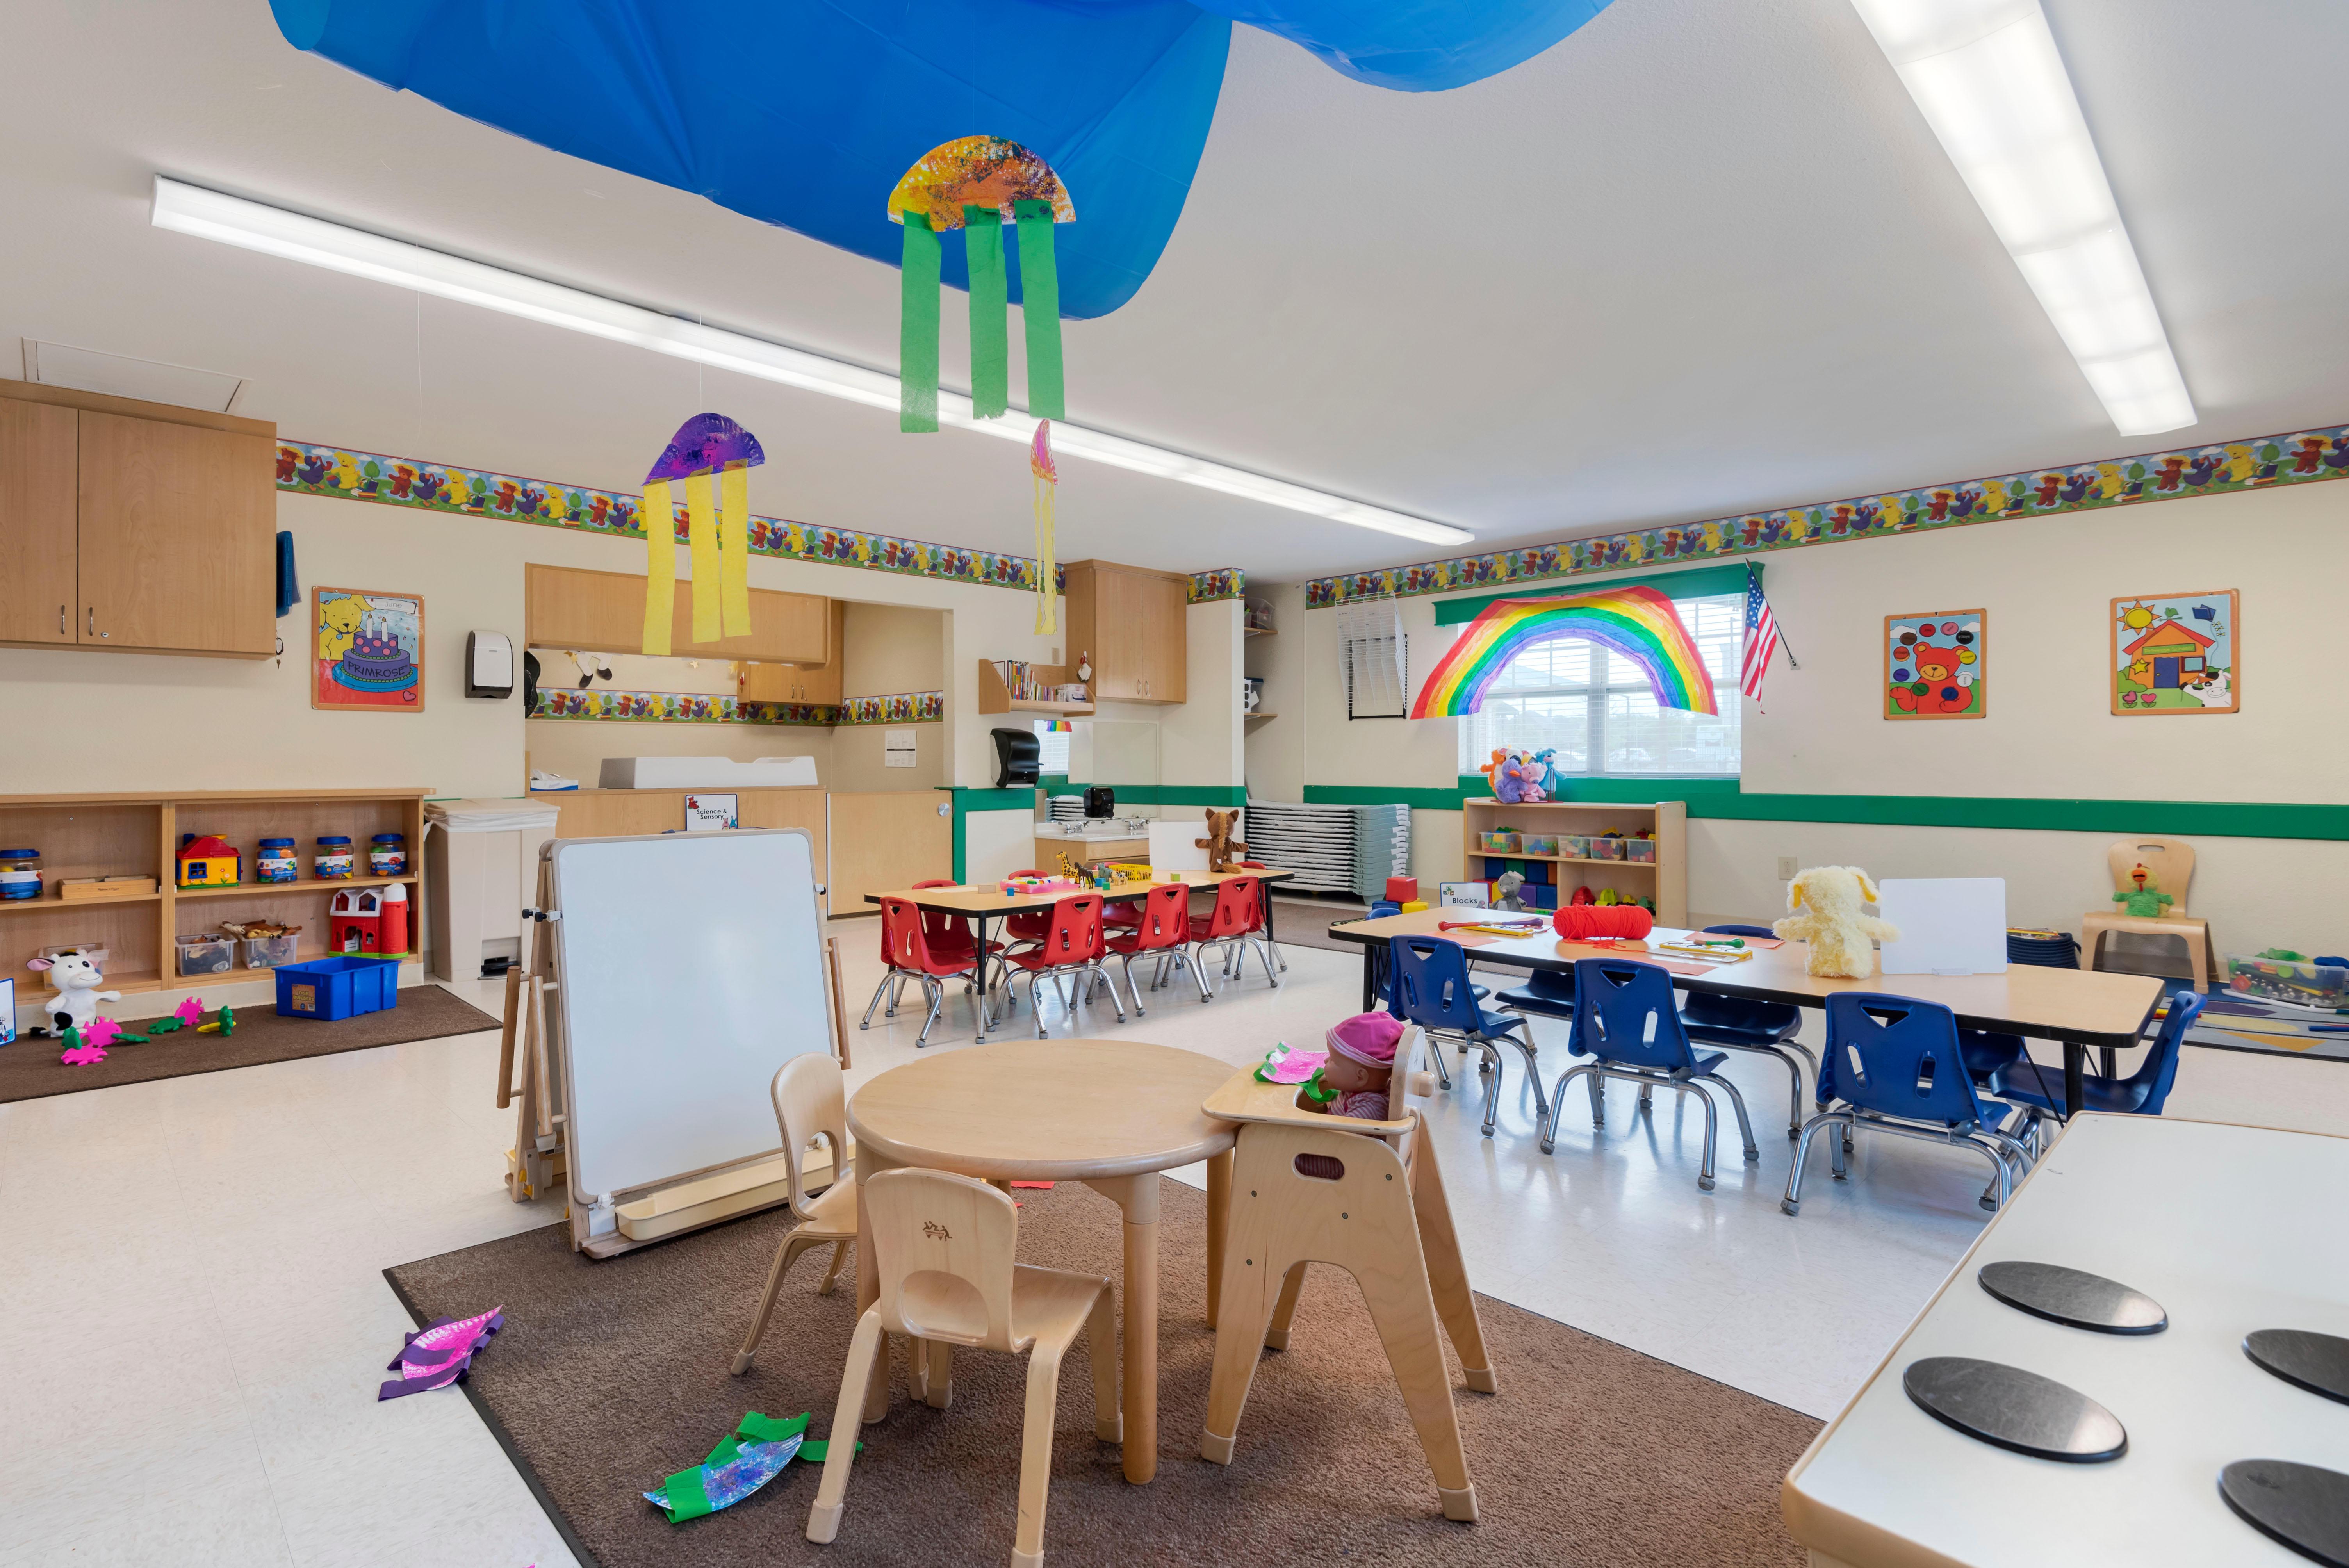 Primrose School of Frisco at Main and Teel